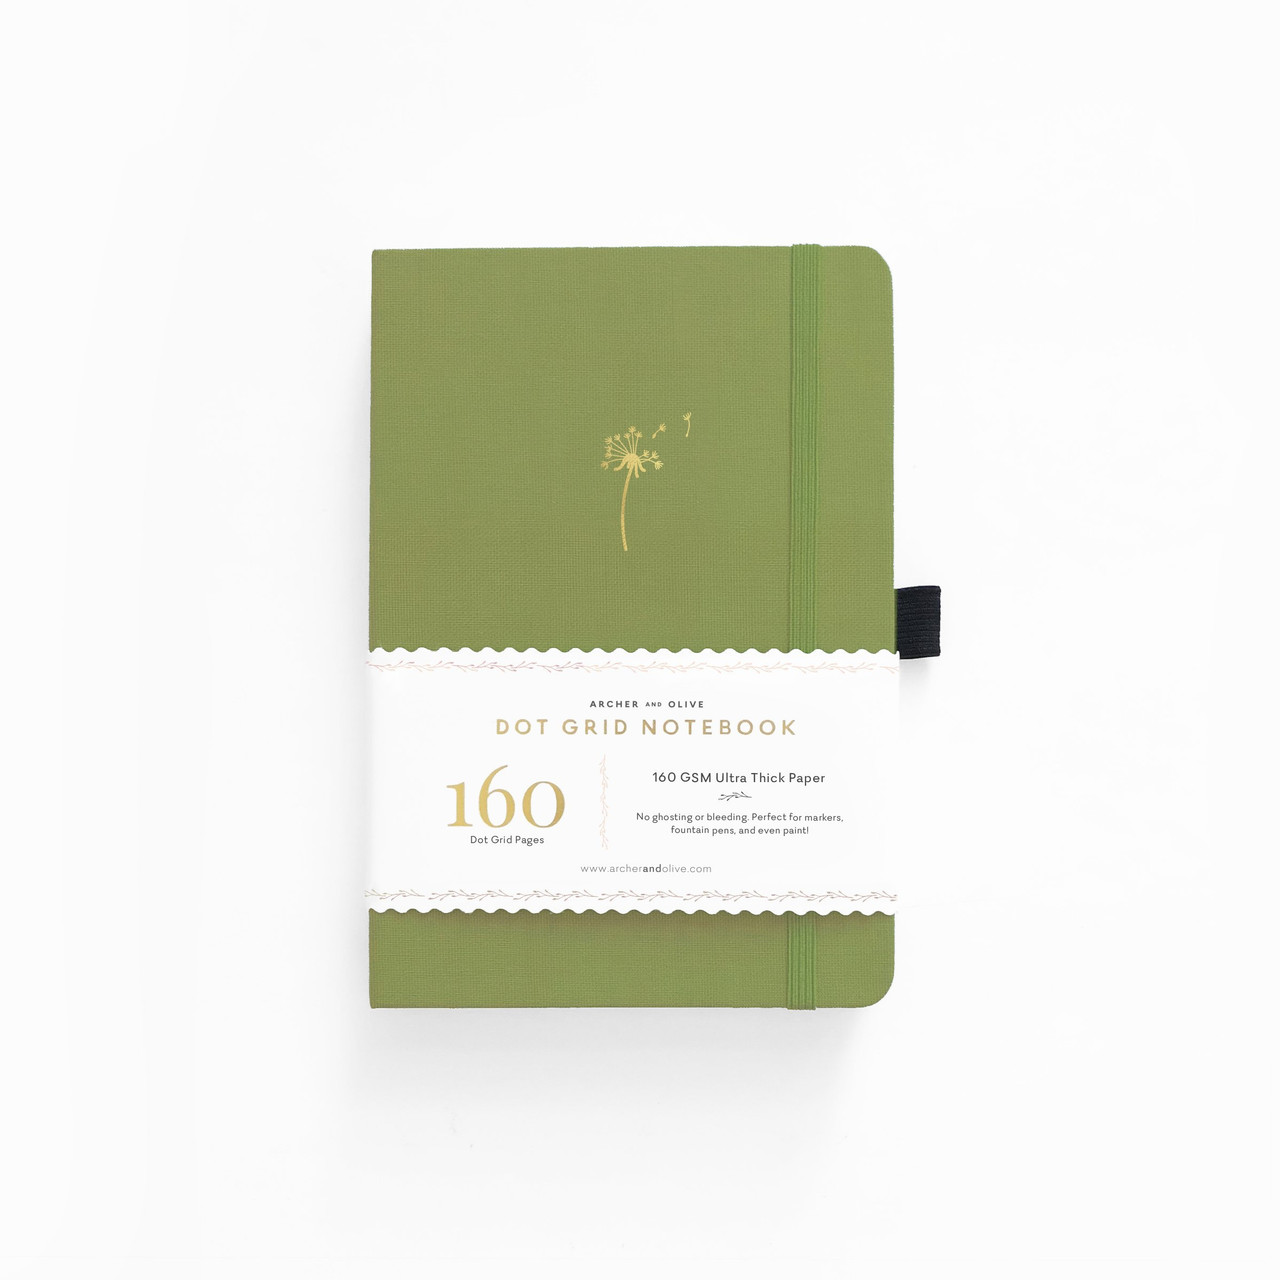 A5 Dandelion Dreams Dot Grid Notebook by Archer & Olive